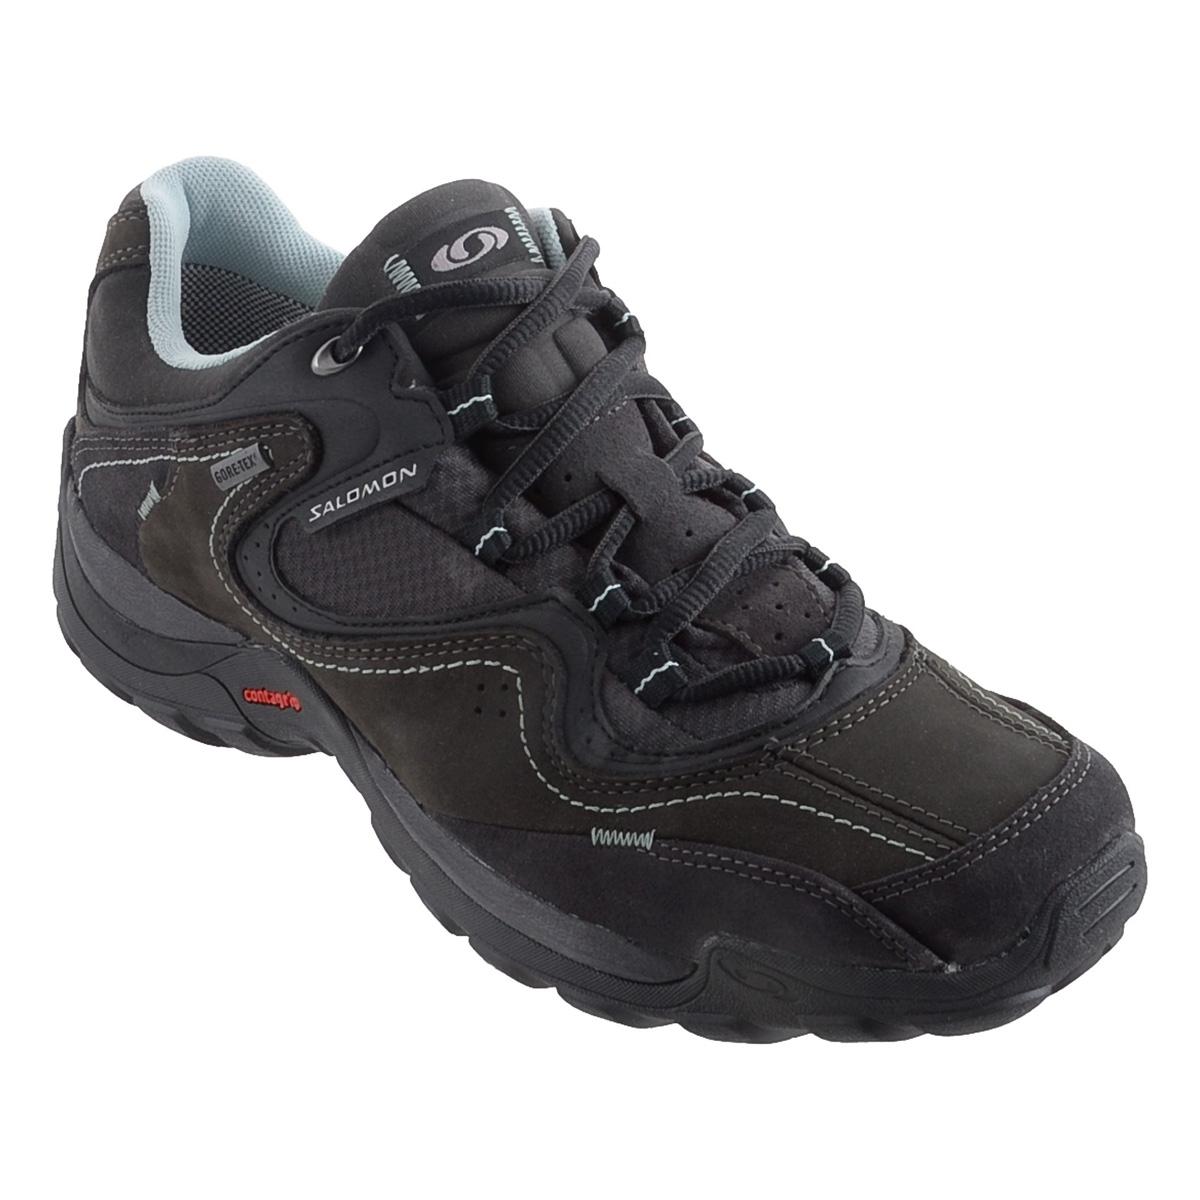 Salomon Elios 2 GTX Walking Shoes (Men's) Asphalt Autobahn Genepi